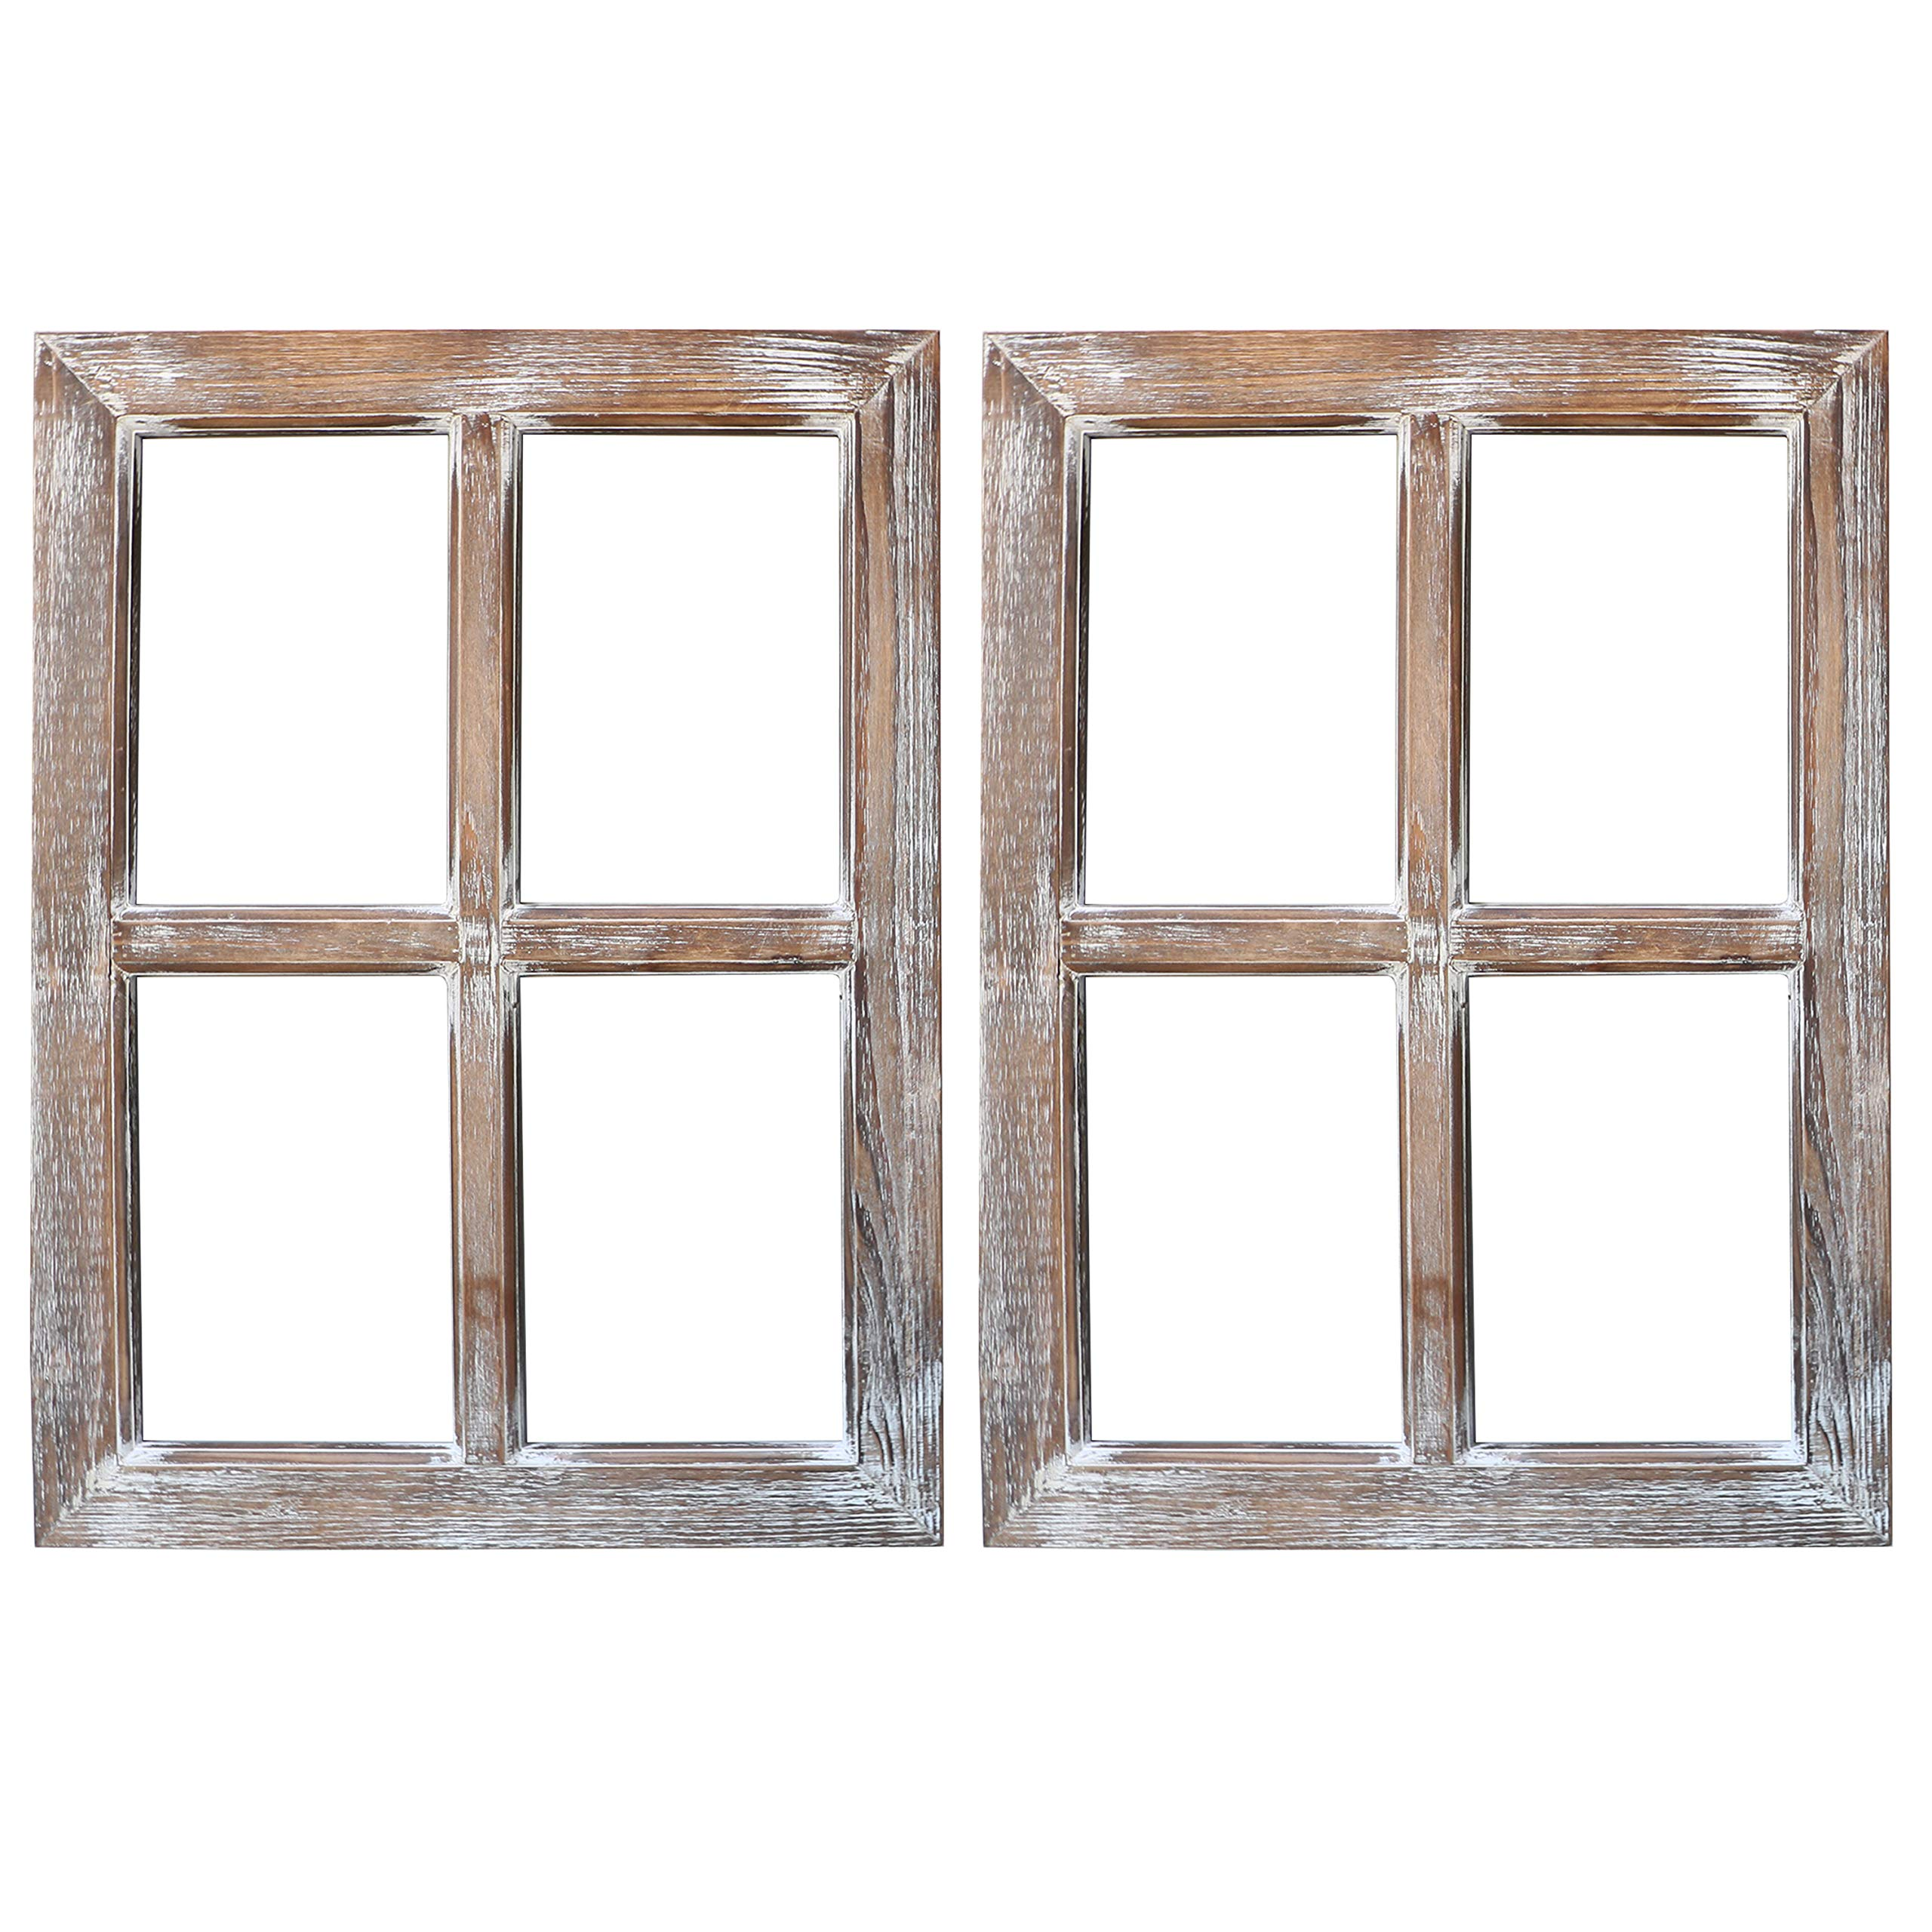 Barnyard Designs Rustic Window Barnwood Frame Primitive Country Farmhouse Wall Decor 18'' x 24'' (2-Pack) by Barnyard Designs